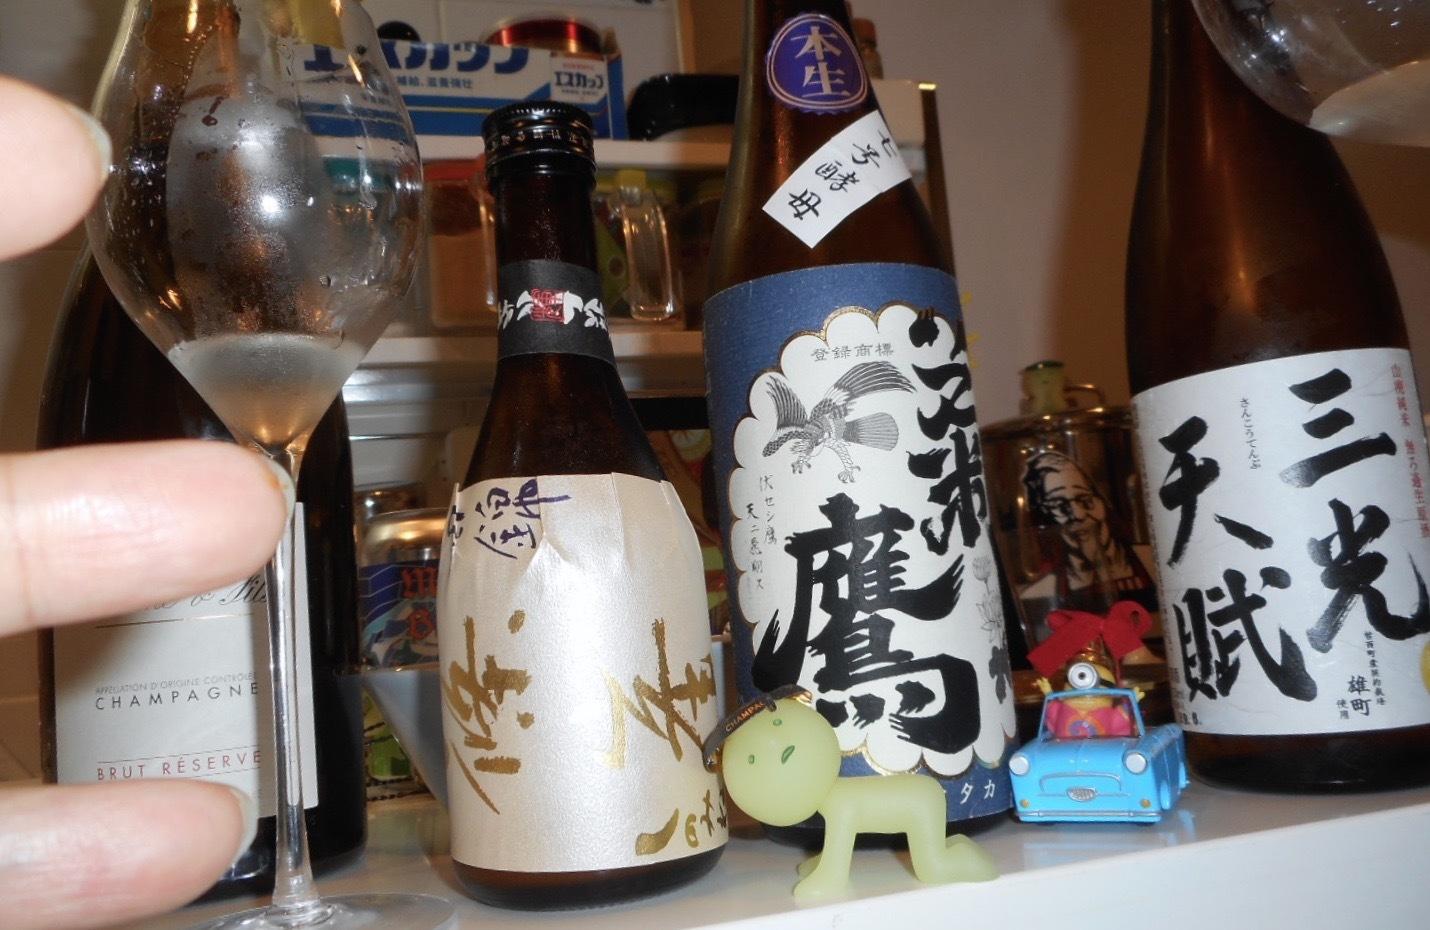 sankoutenpu_yamahai_omachi28by11.jpg